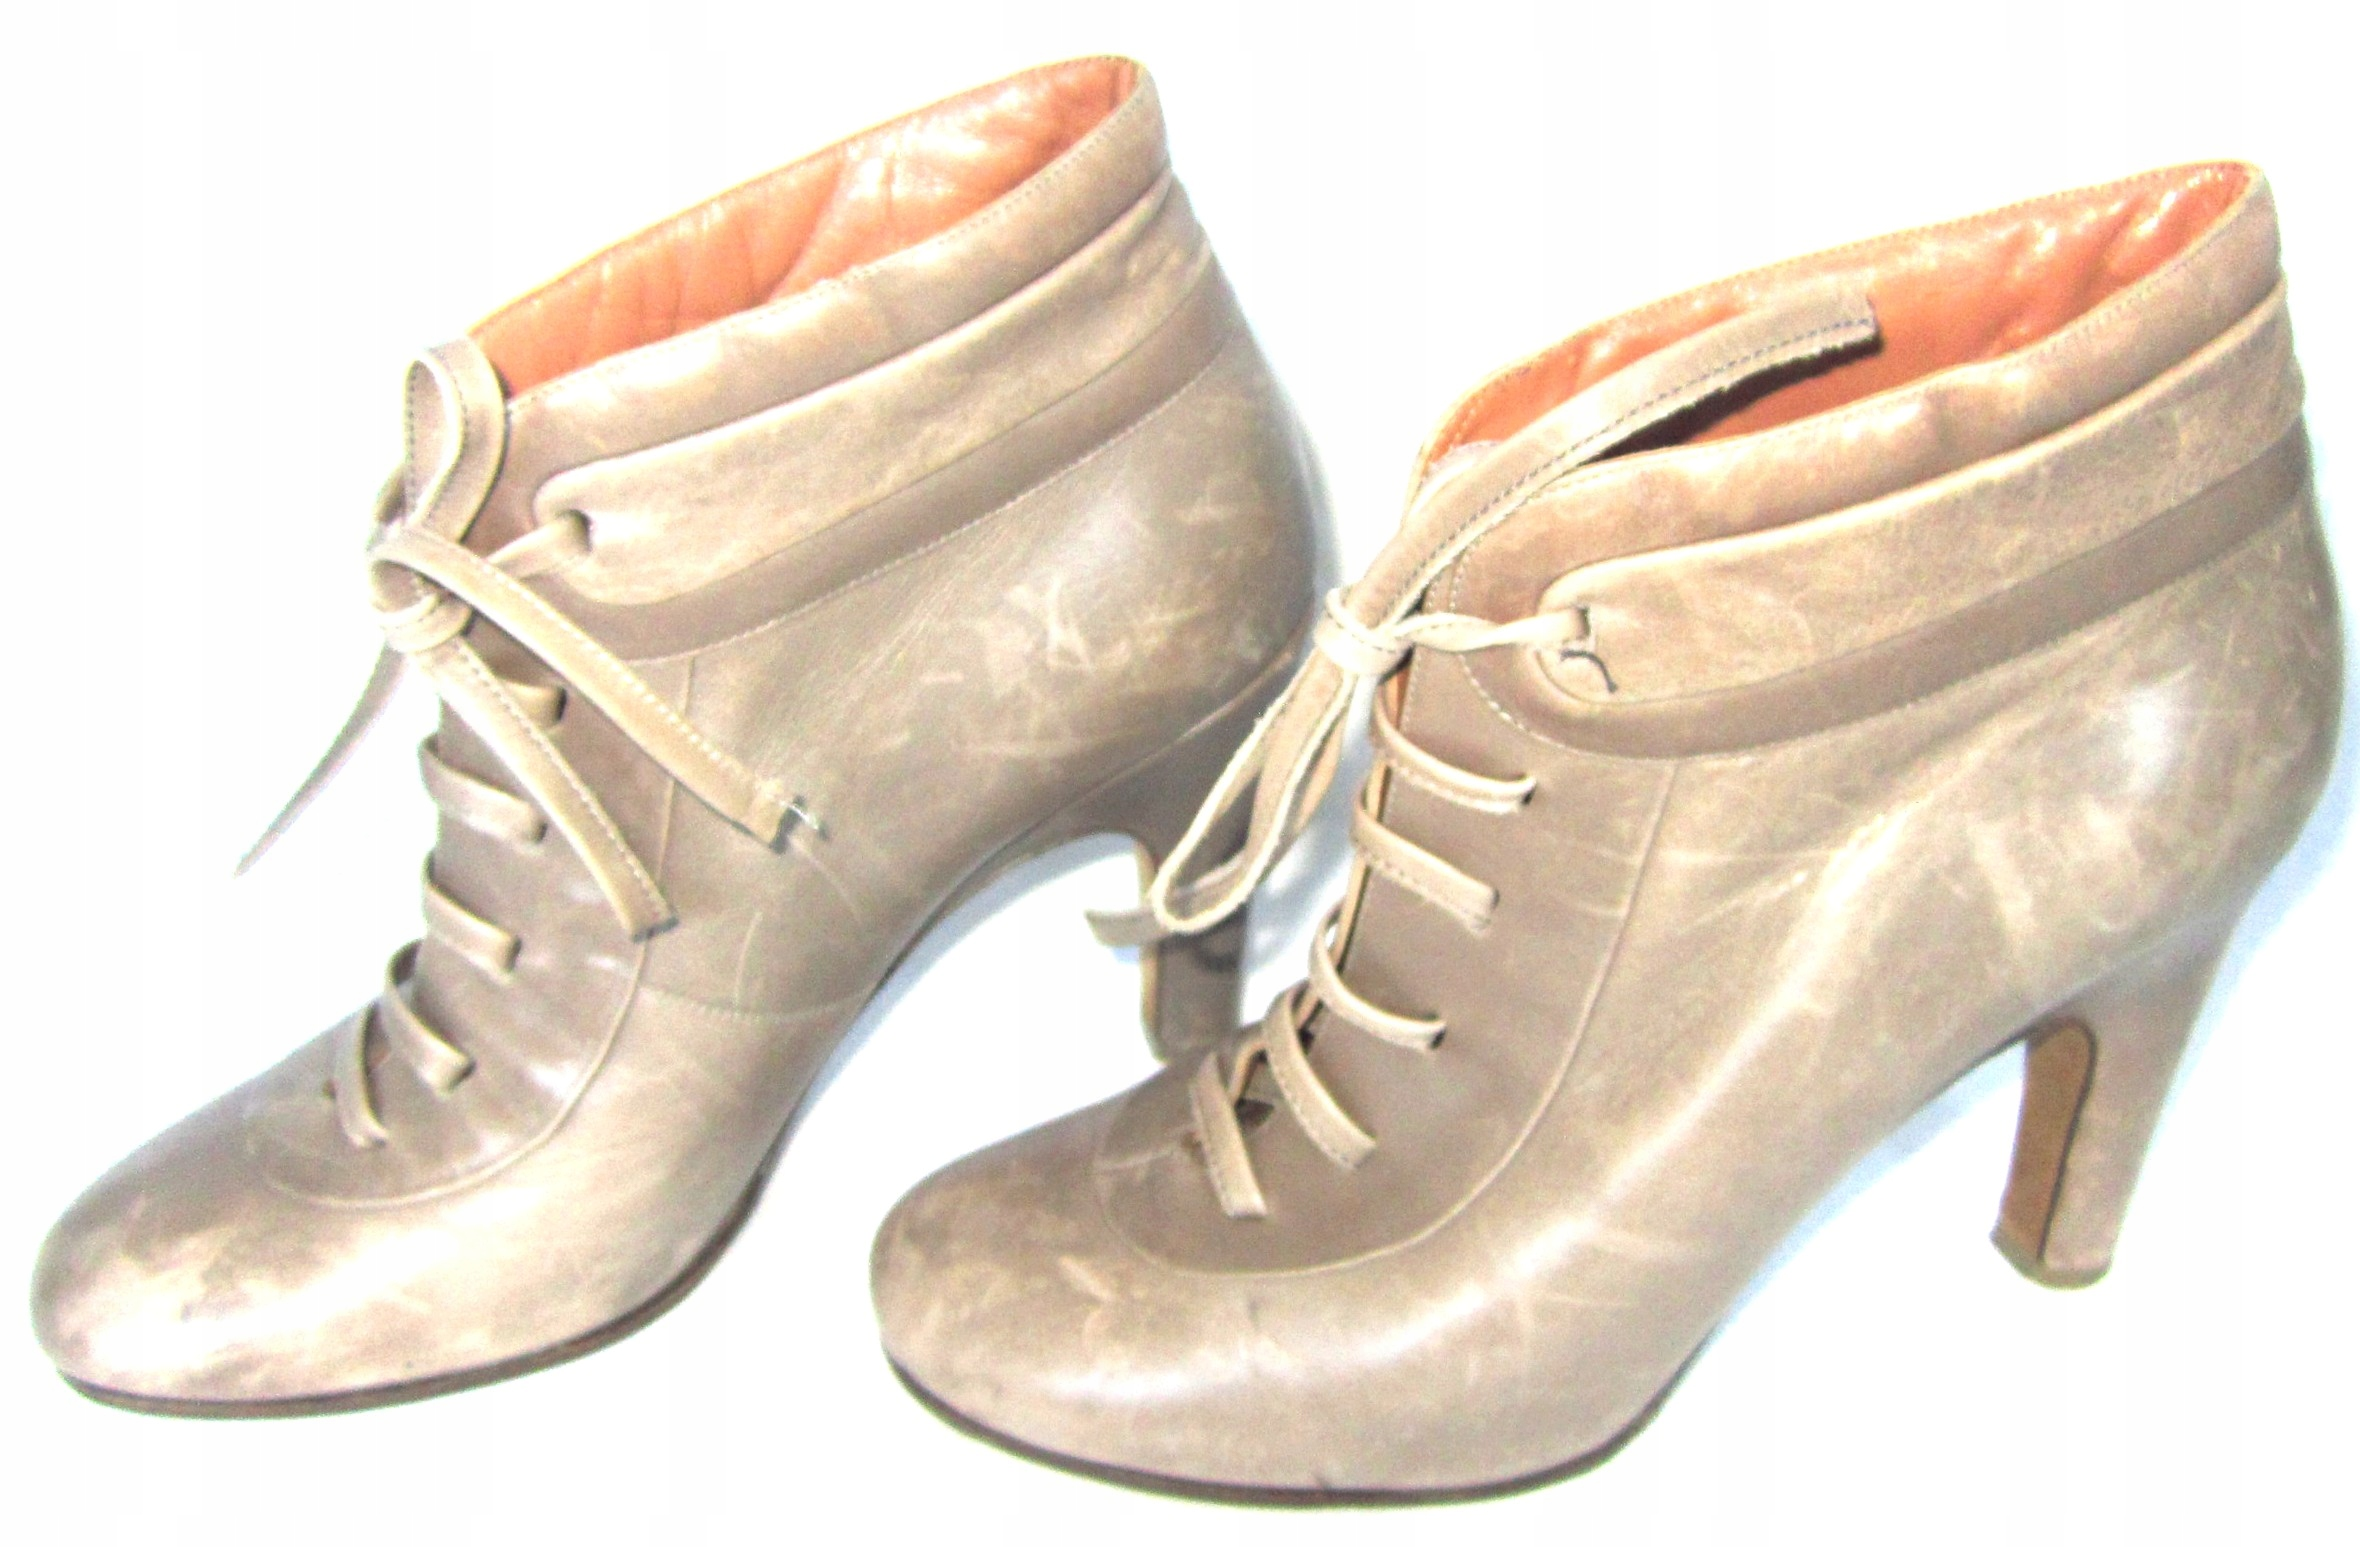 FURLA podľa NICOLE BRUNDAGE_38_24,5 cm_Vintage Topánky